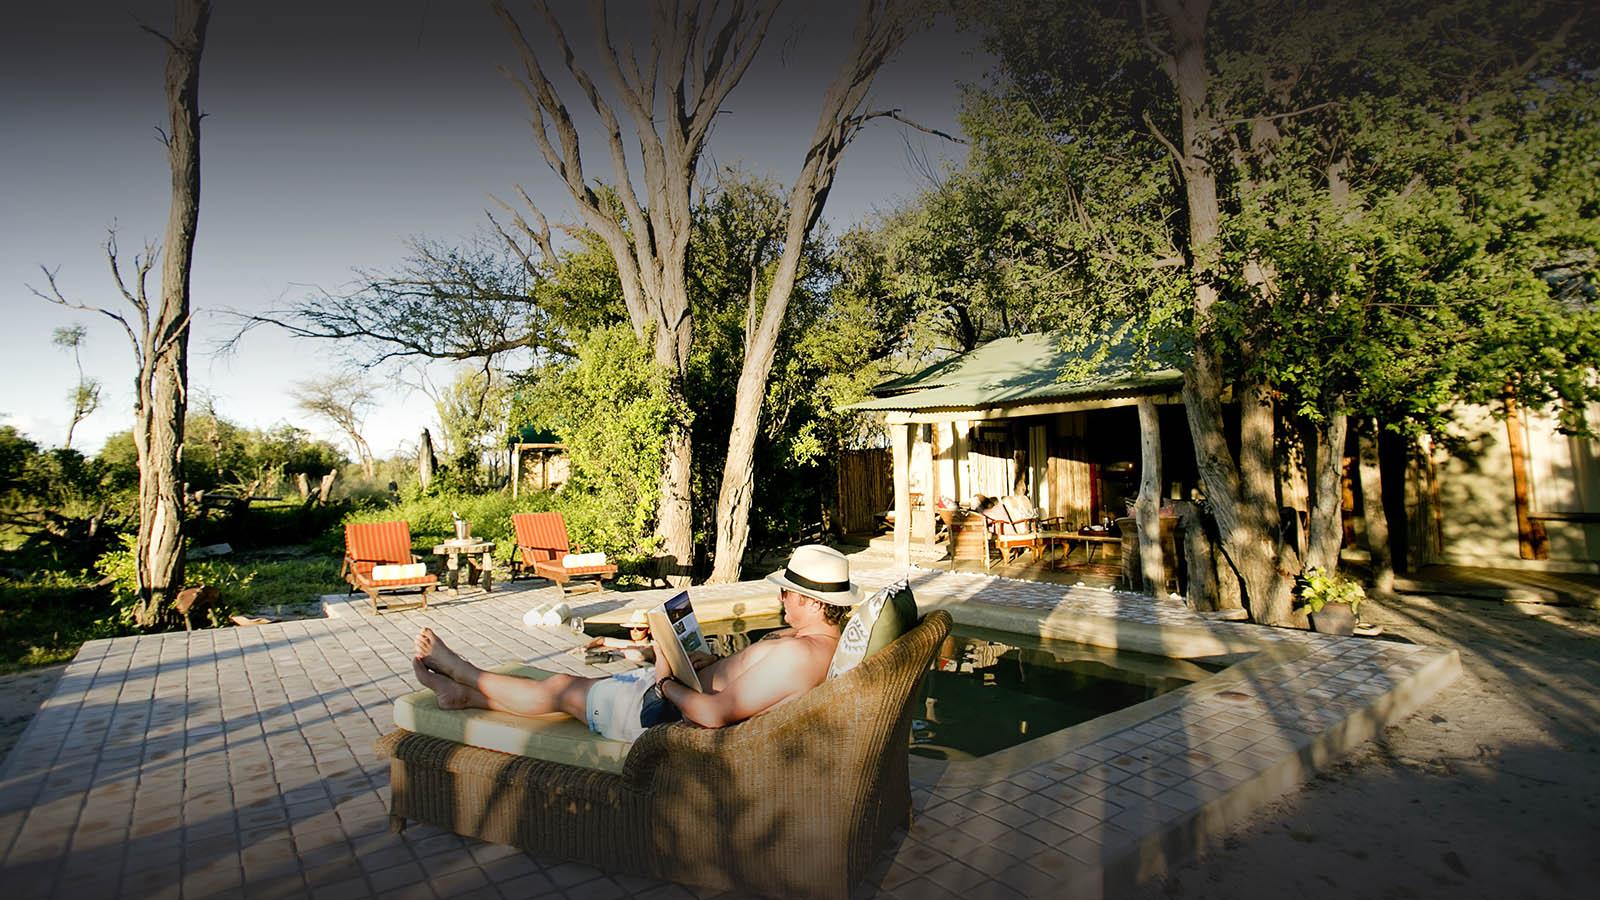 the hide hwange-national-park-lodges-zimbabwe-accommodation-toms-little-hide-pool-area